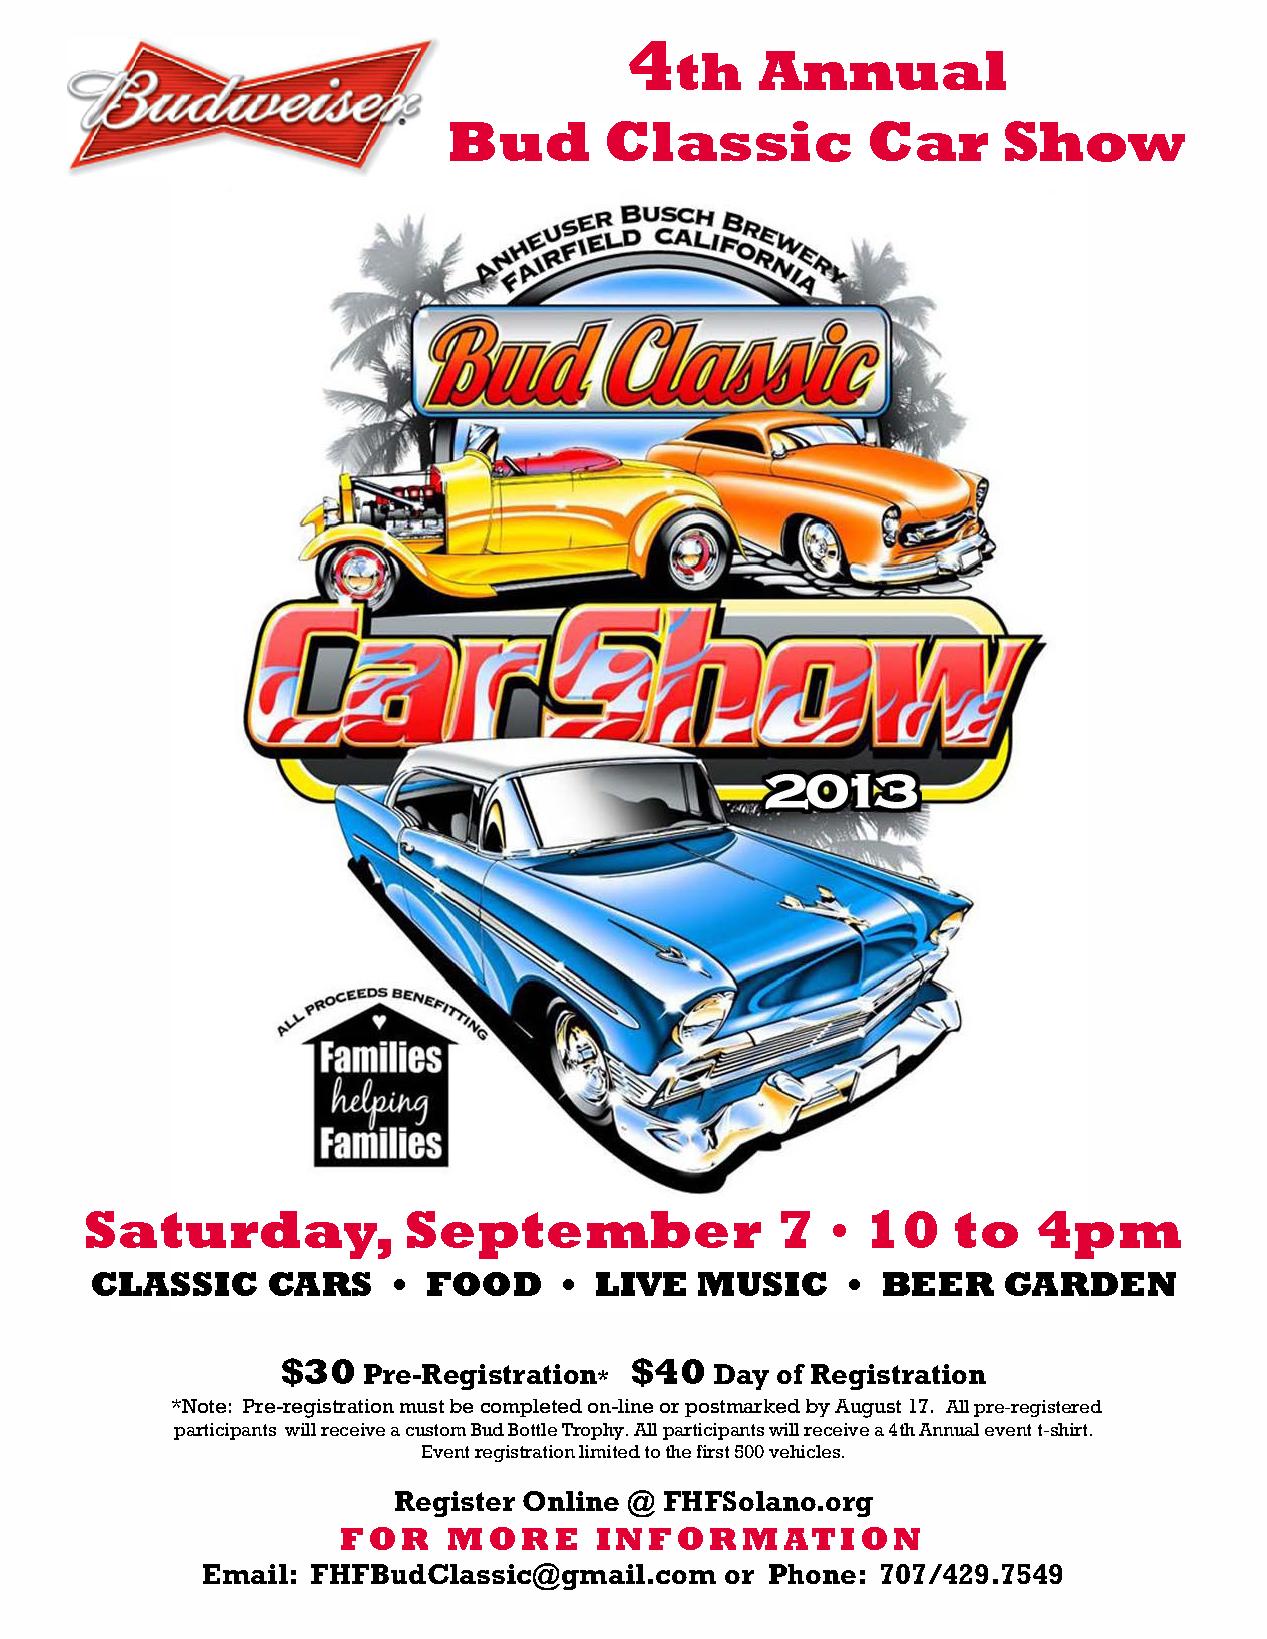 2013 4th Annual Bud Classic Car Show